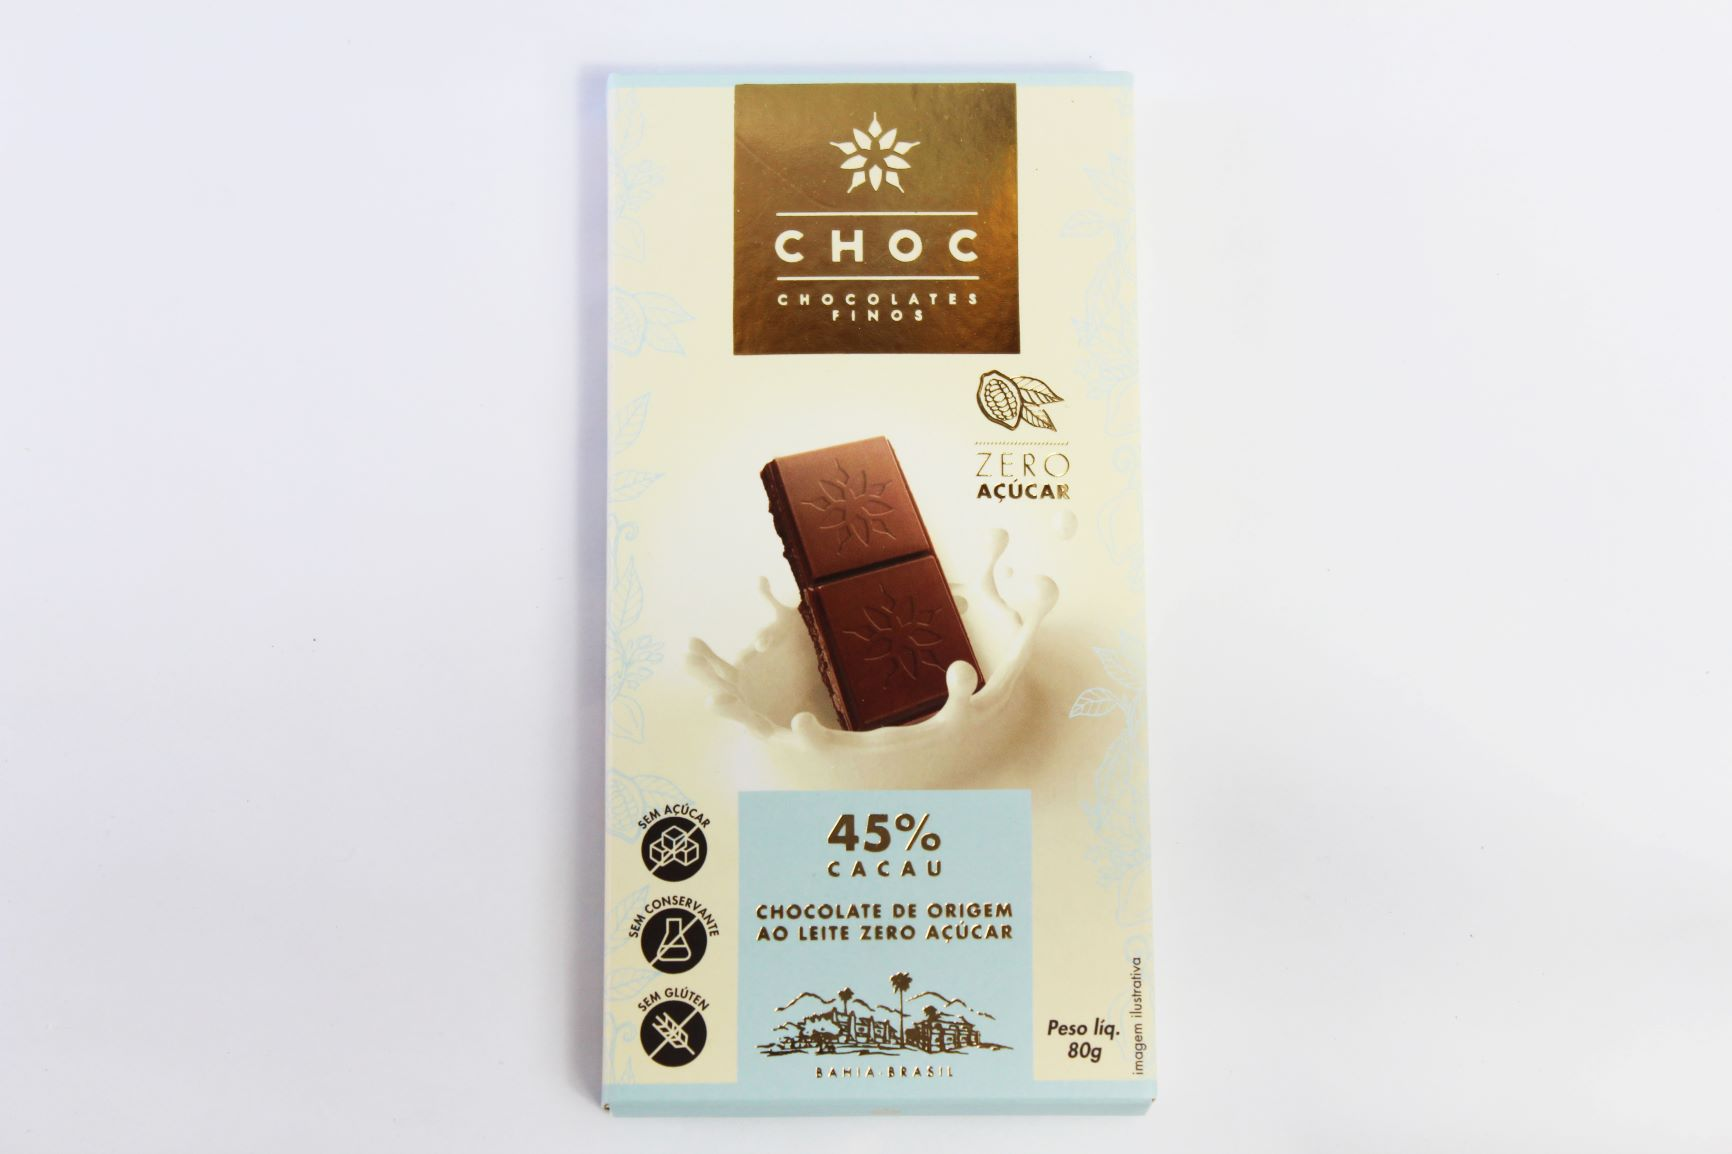 Choc - Chocolates Finos 45% Cacau 80g